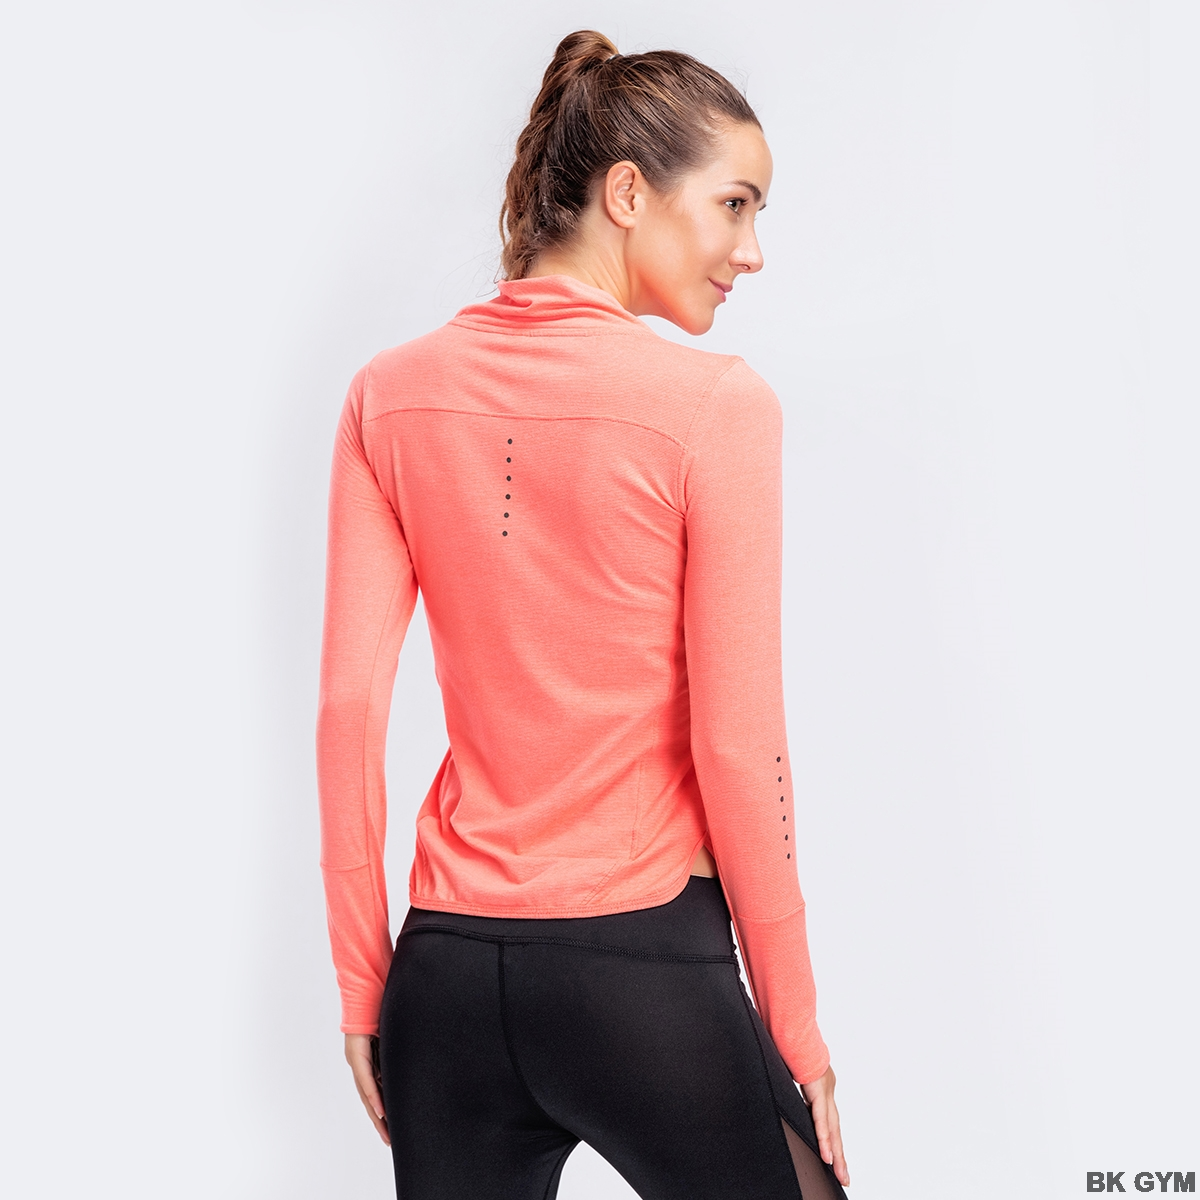 manga longa treino fitness correndo esporte t-shirts treinamento yoga outono